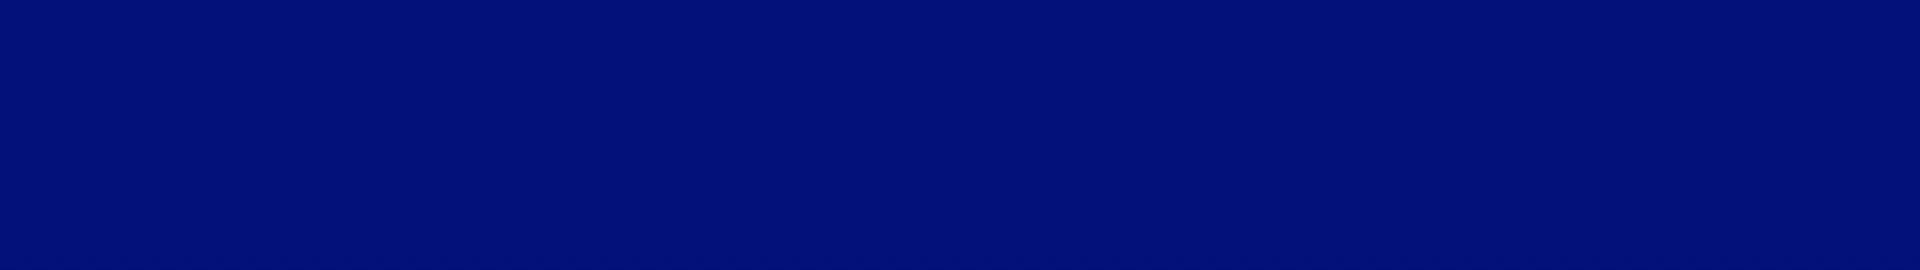 background-blue